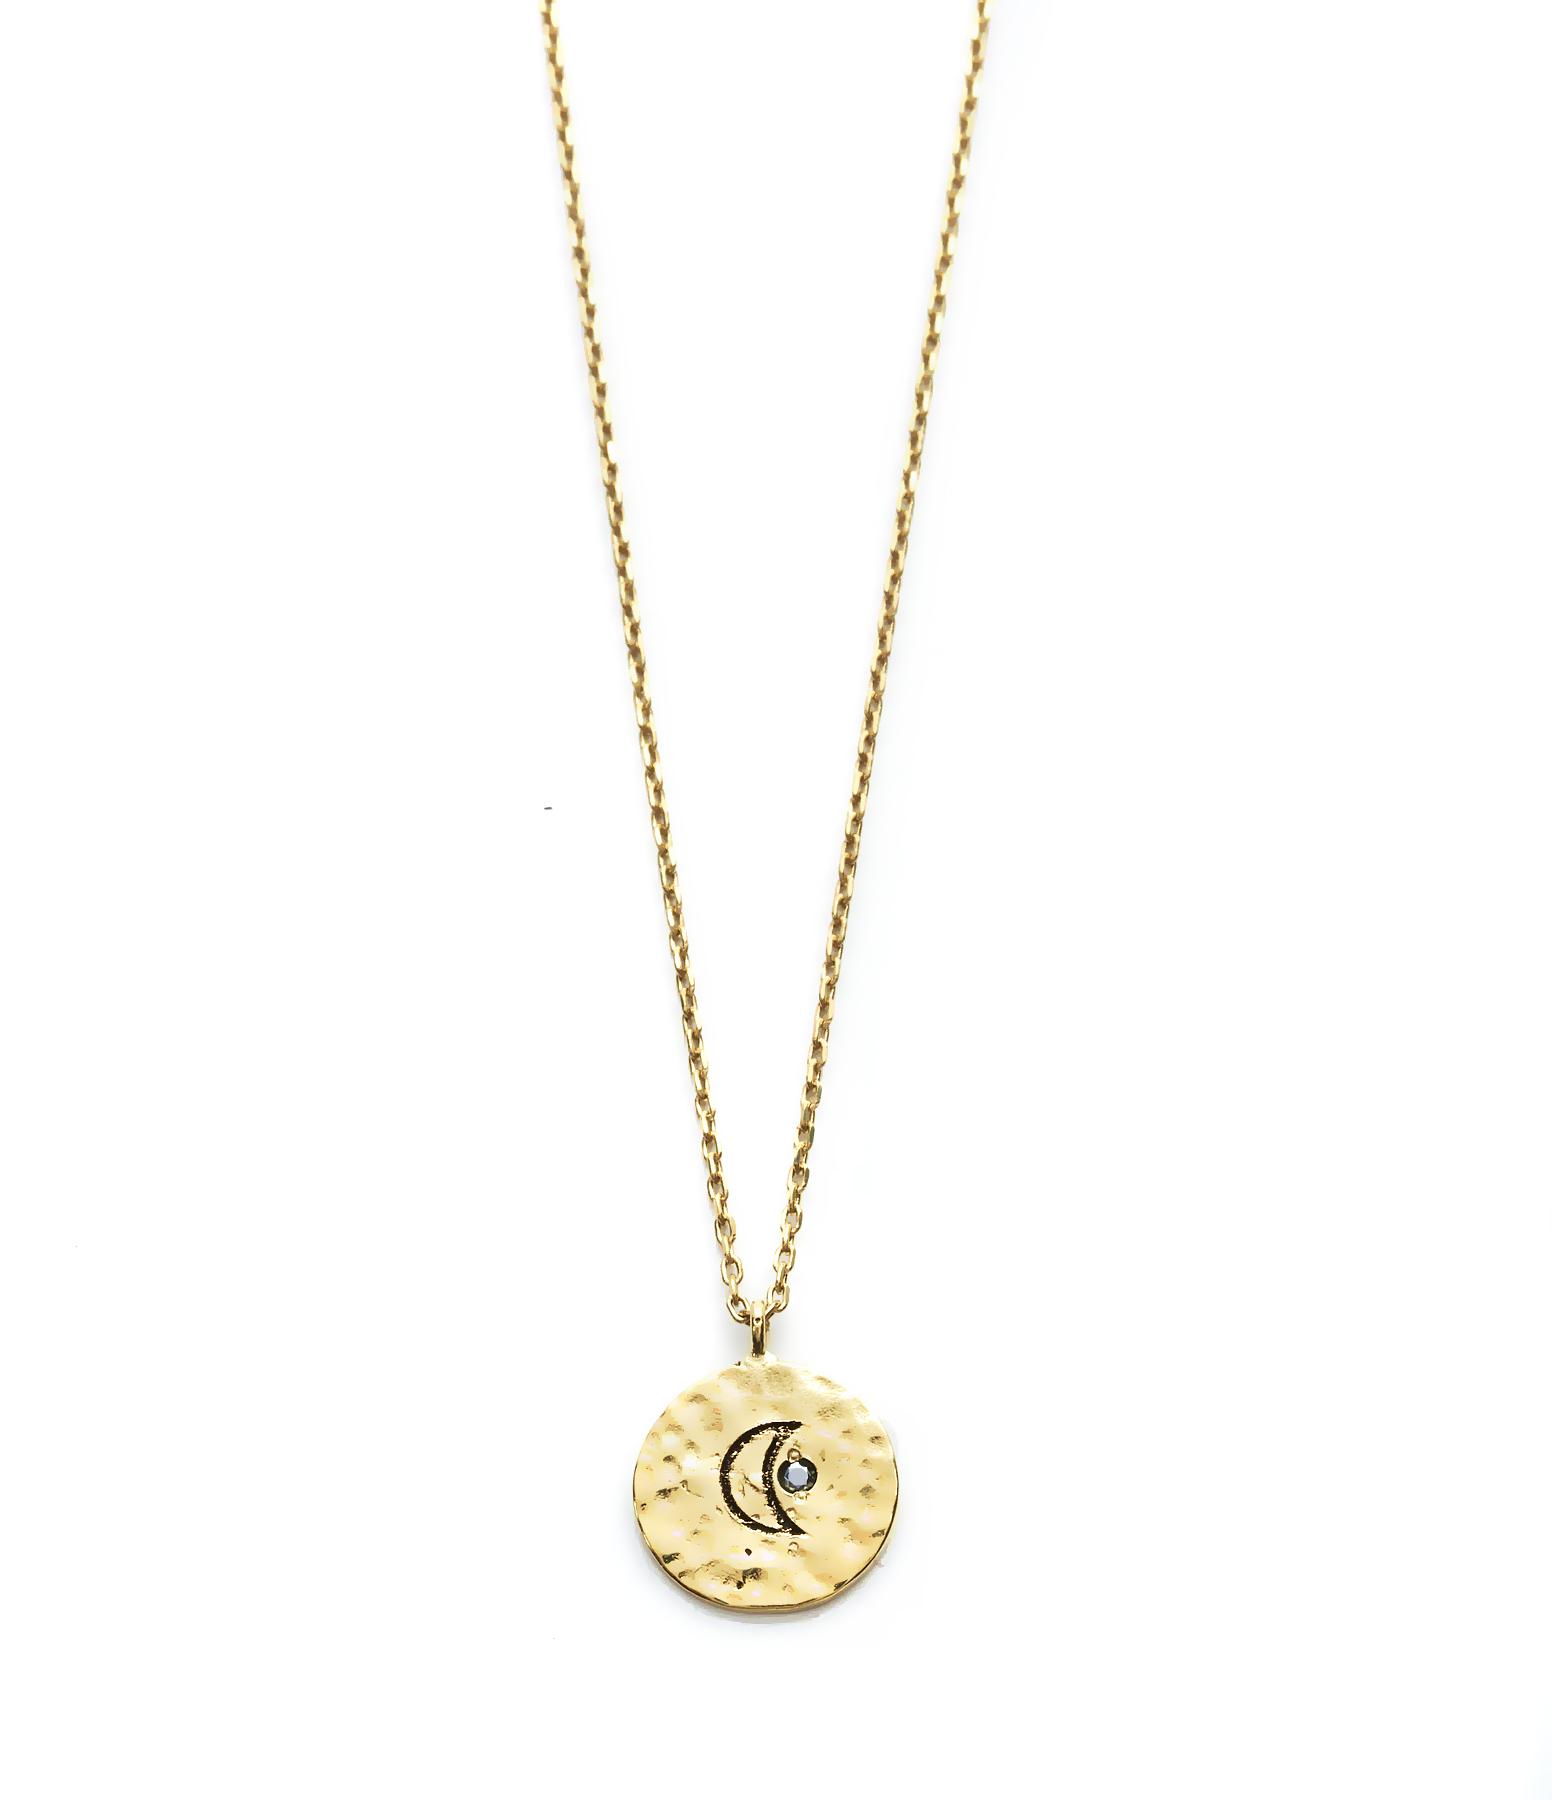 Collier Court Médaille Lune Ibiza 9K